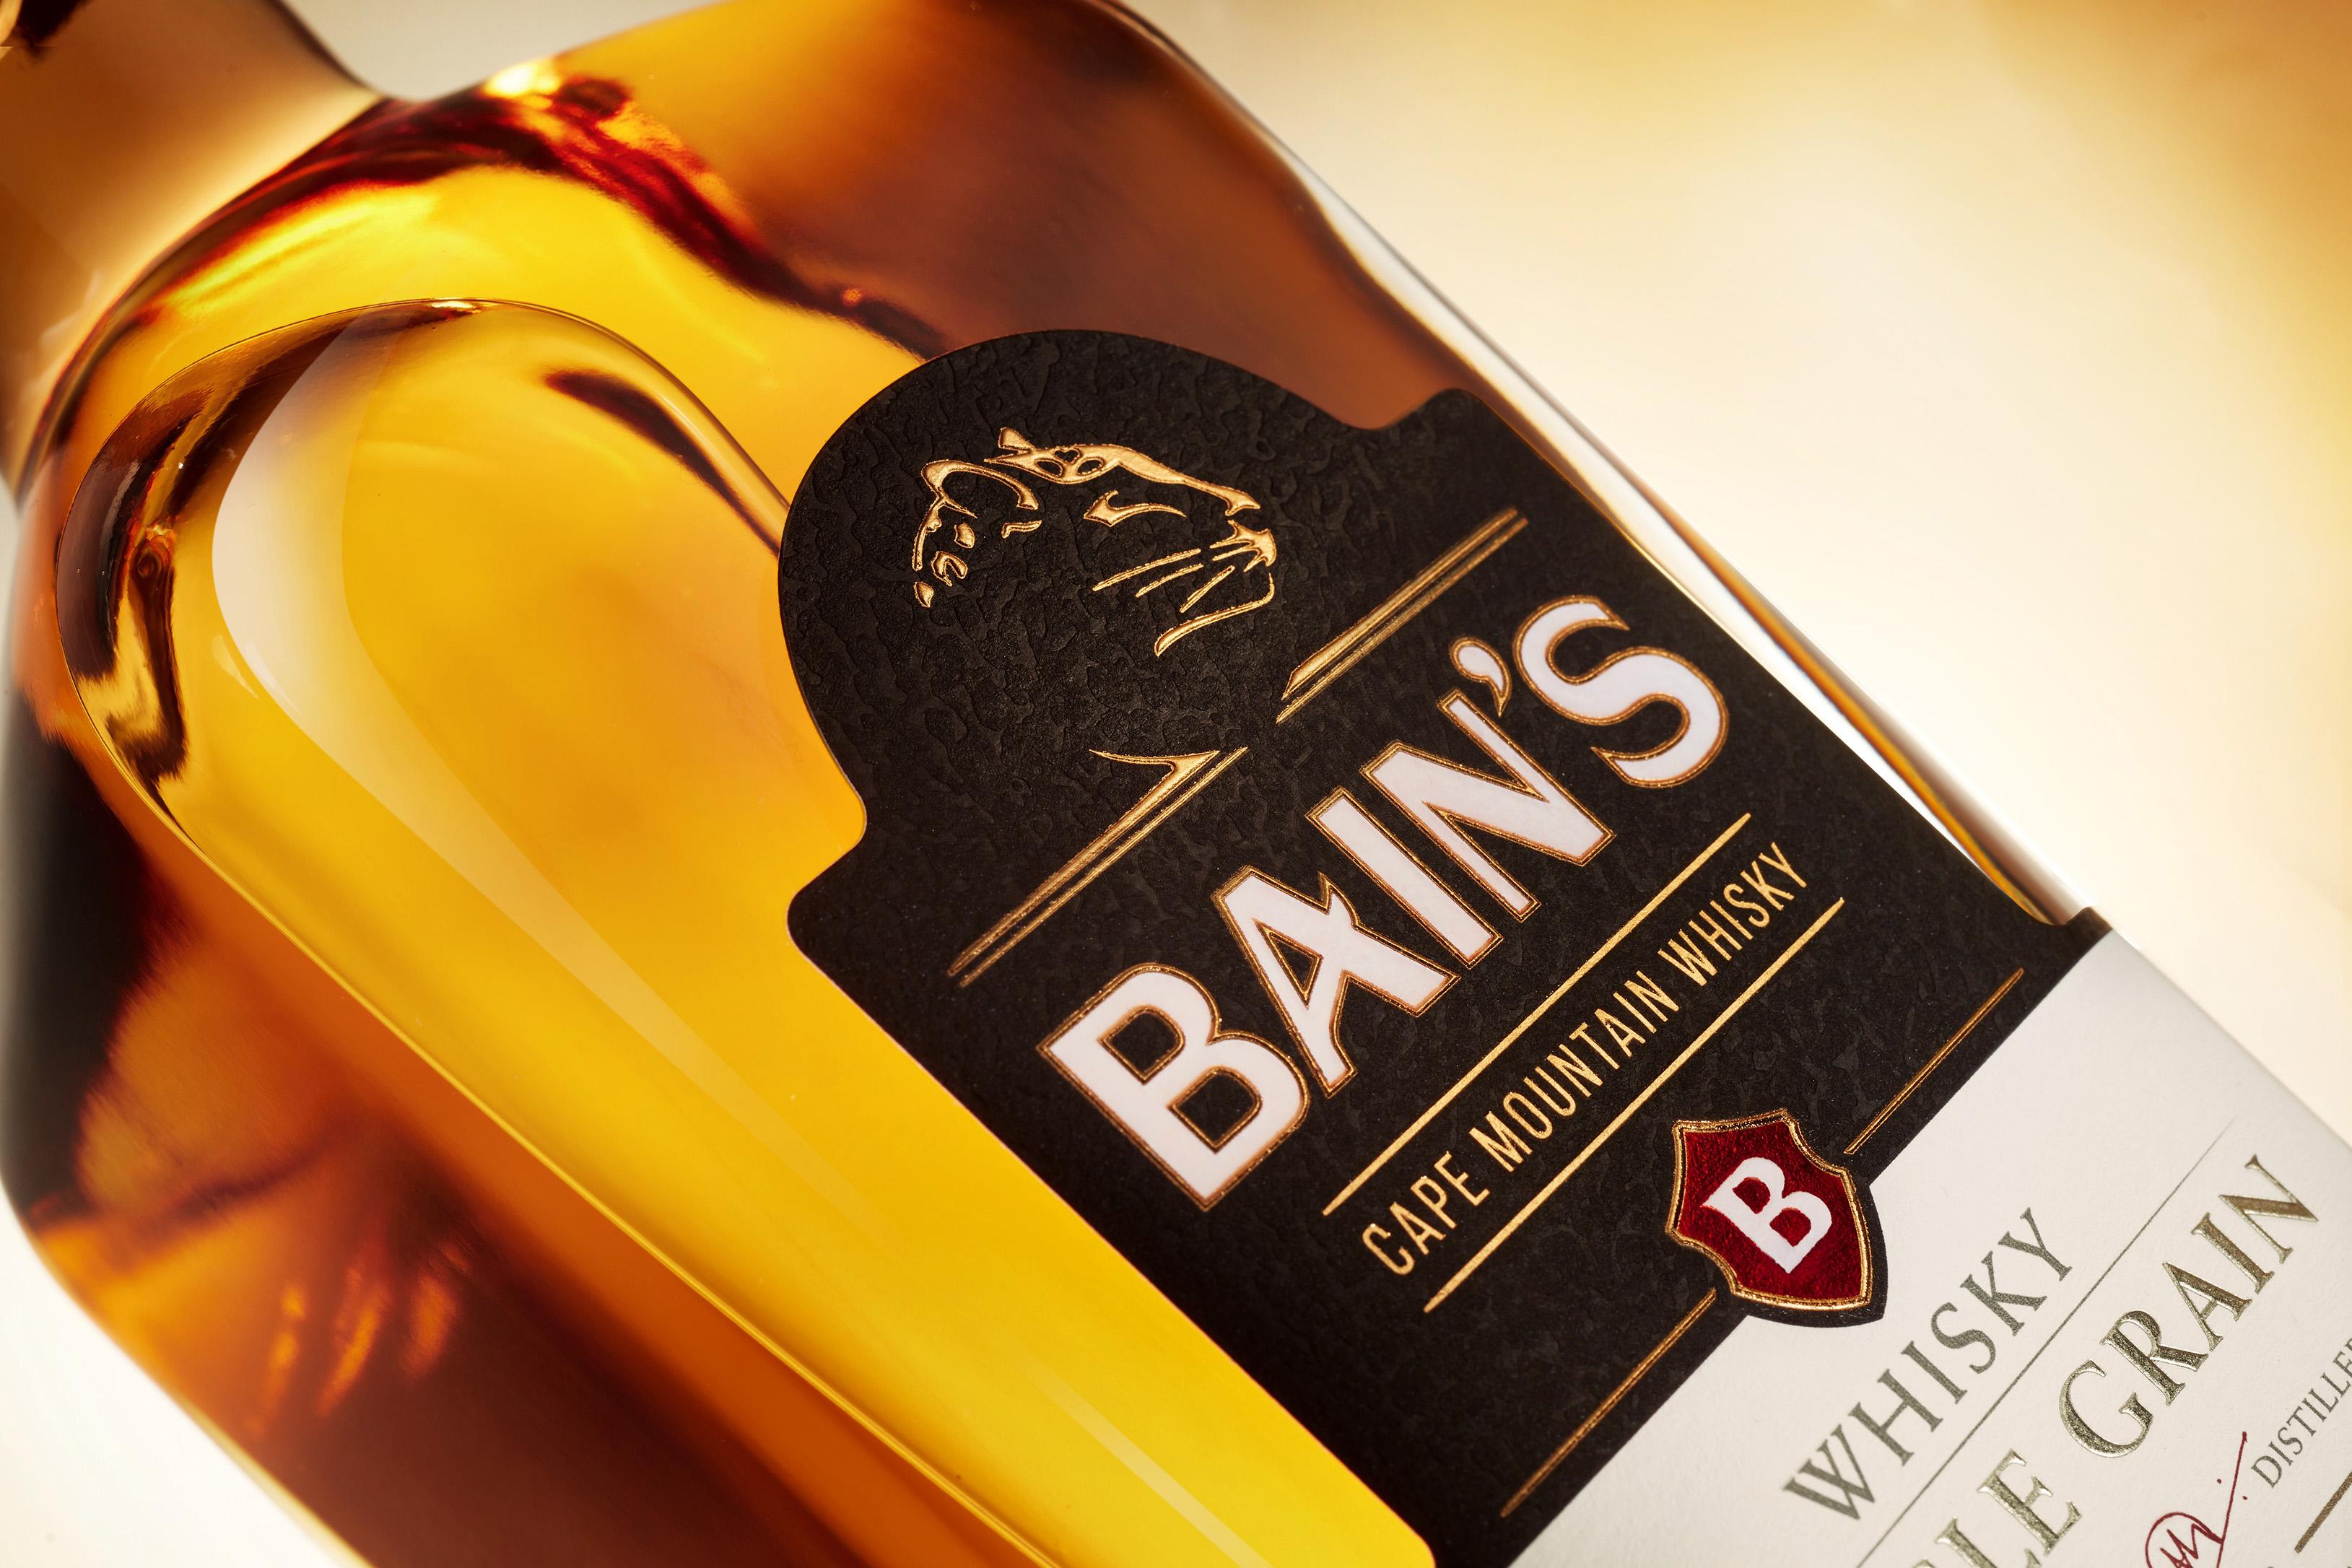 Bain's Wins World's Best Grain Whisky photo